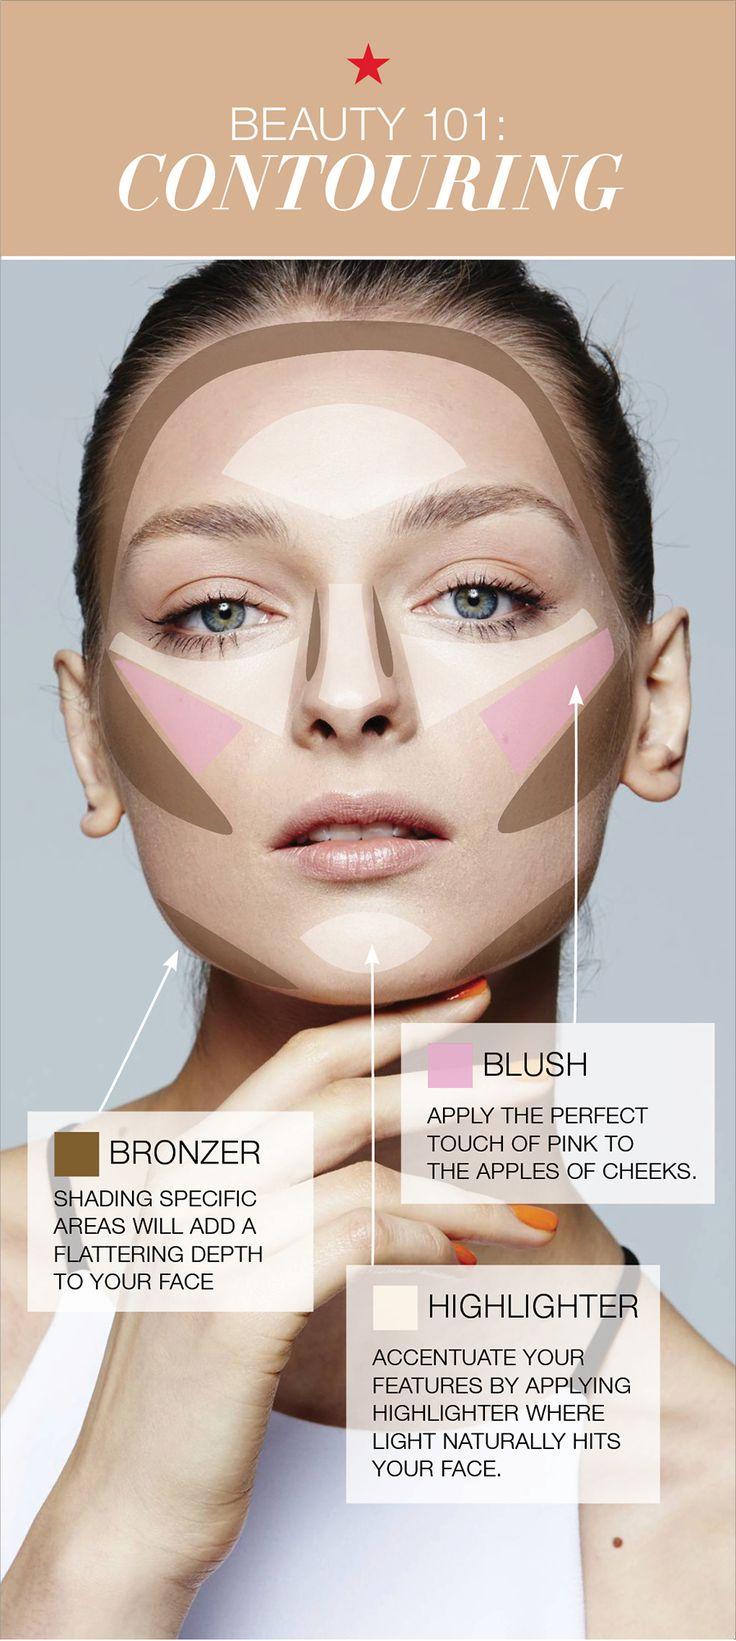 Instagram Makeup Brushes: Best Ideas For Makeup Tutorials : No Matter How Easy